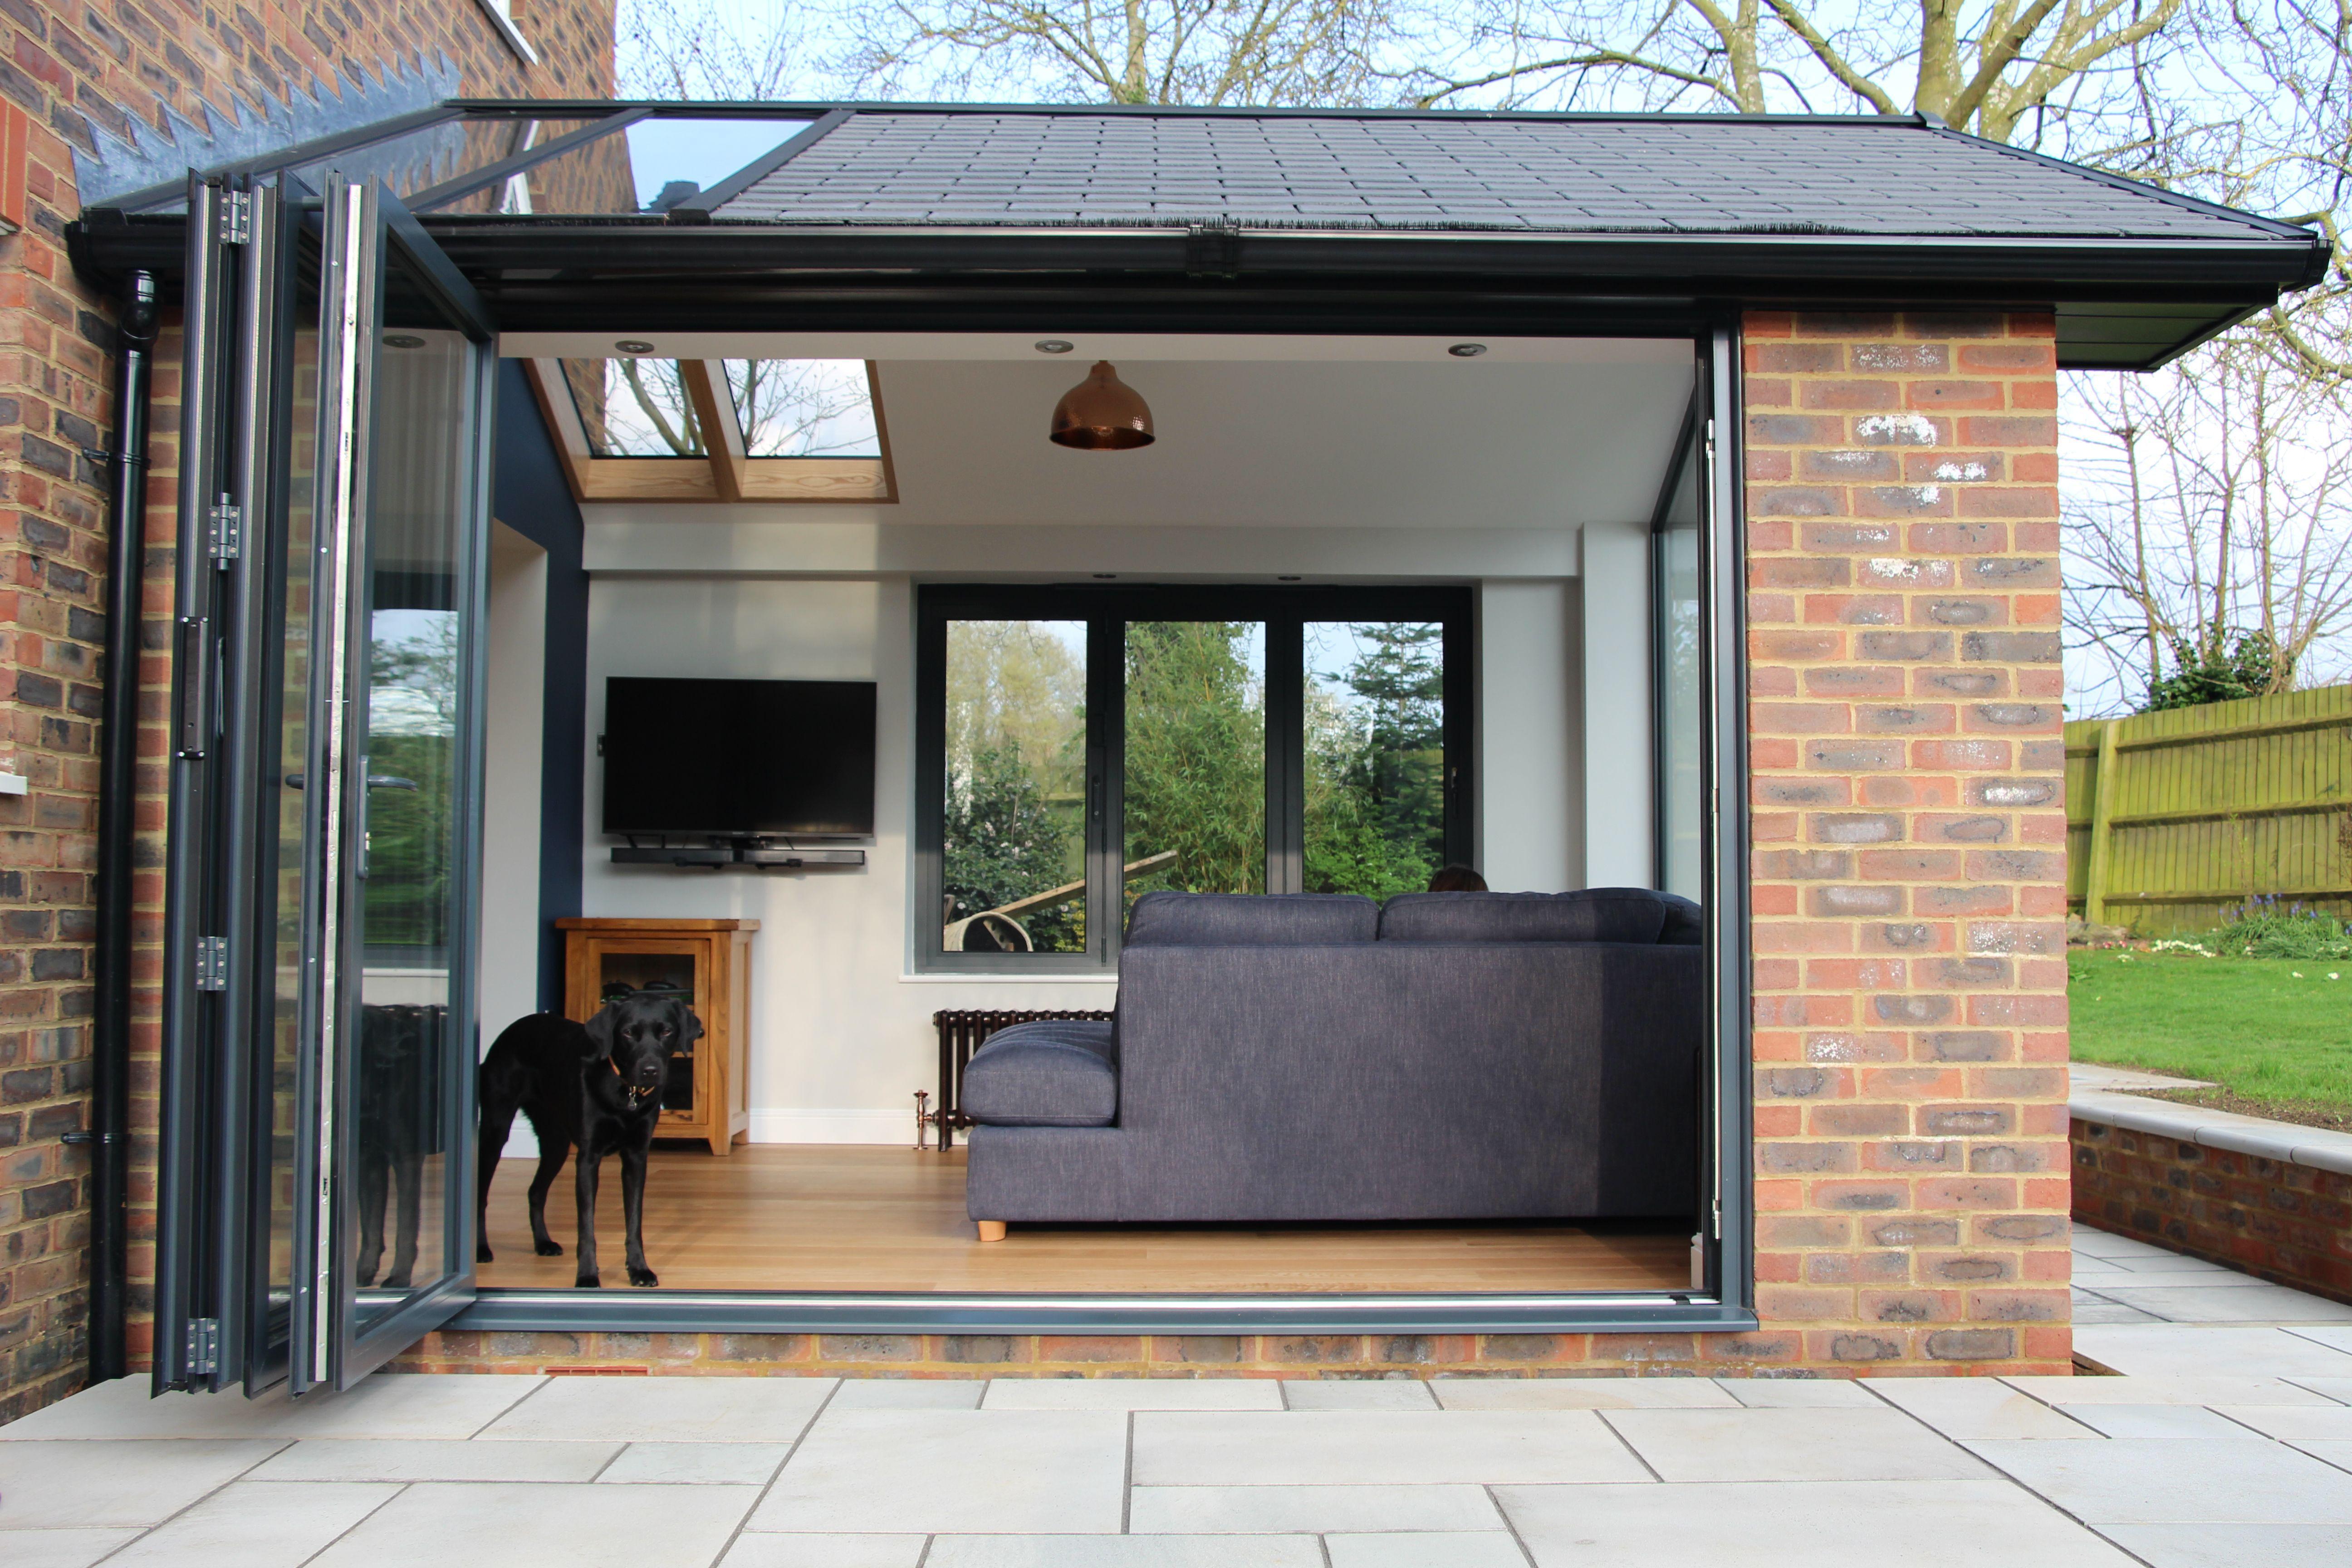 Pin By Varias Ideas On Veranda In 2020 House Extension Design House Extension Plans House Extensions